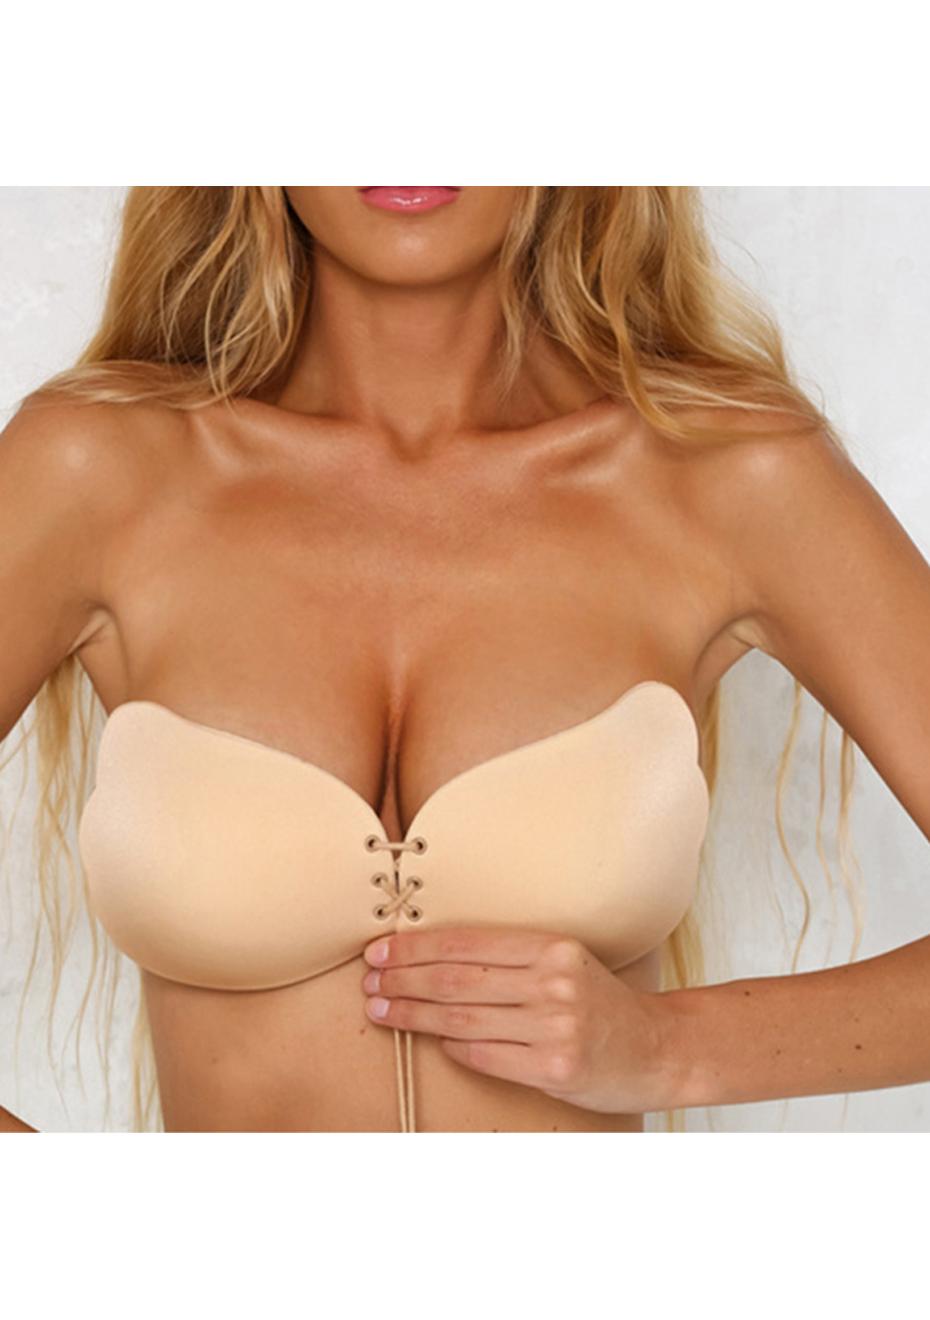 a20bfb939b29c Invisible angel bra nude strapless silicone nude invisible angel lift bra  onceit jpg 1268x1800 Angel bra